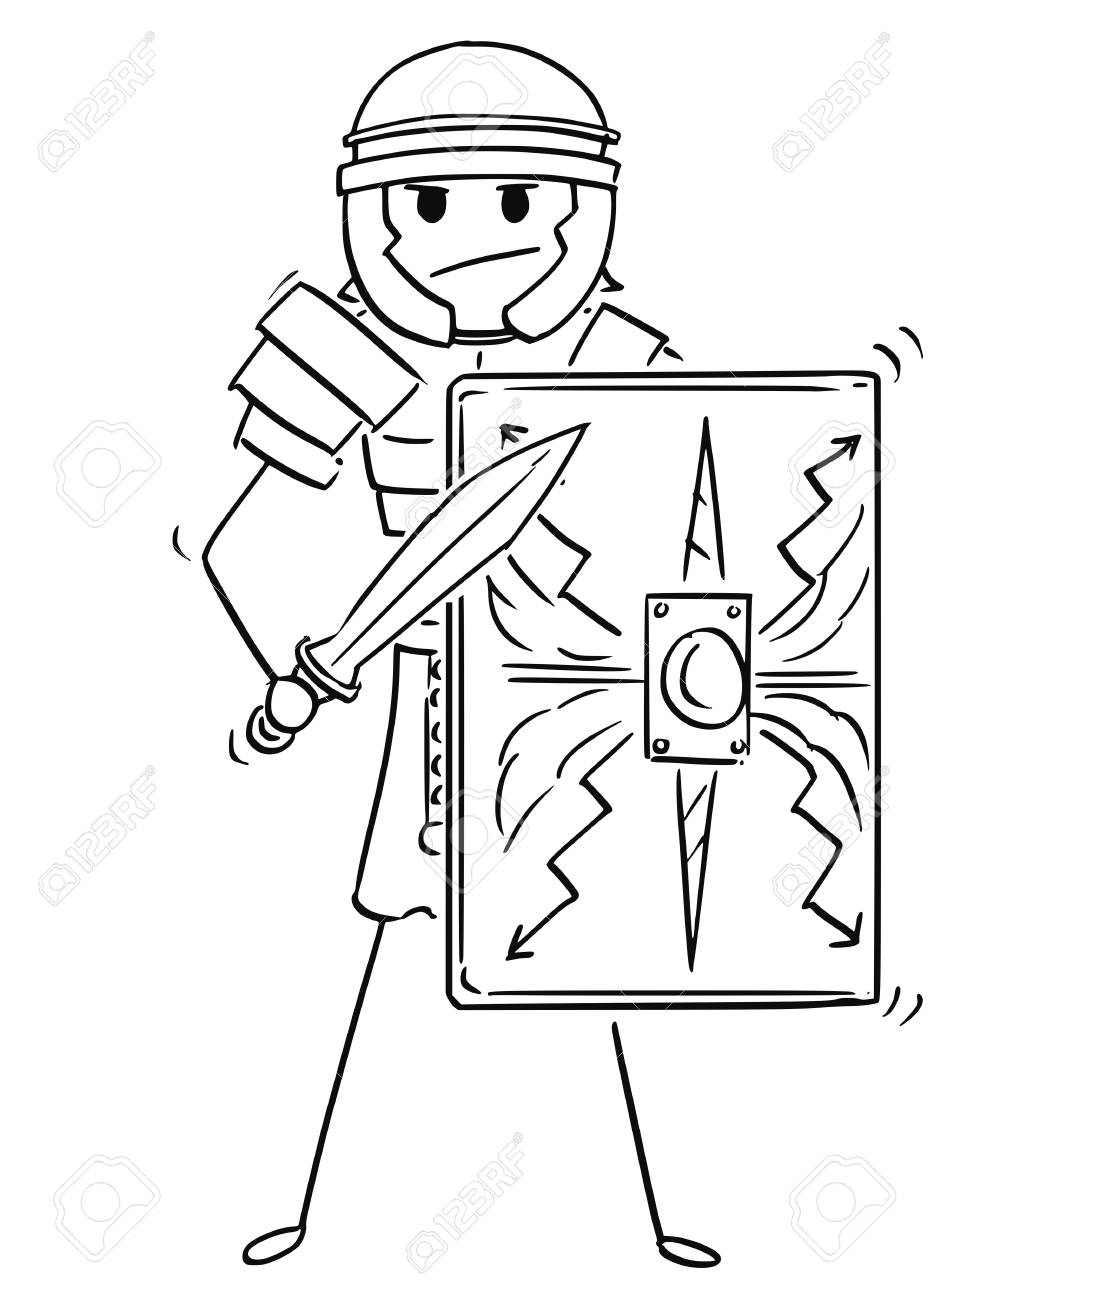 Cartoon Stick Man Drawing Conceptual Illustration Of Ancient